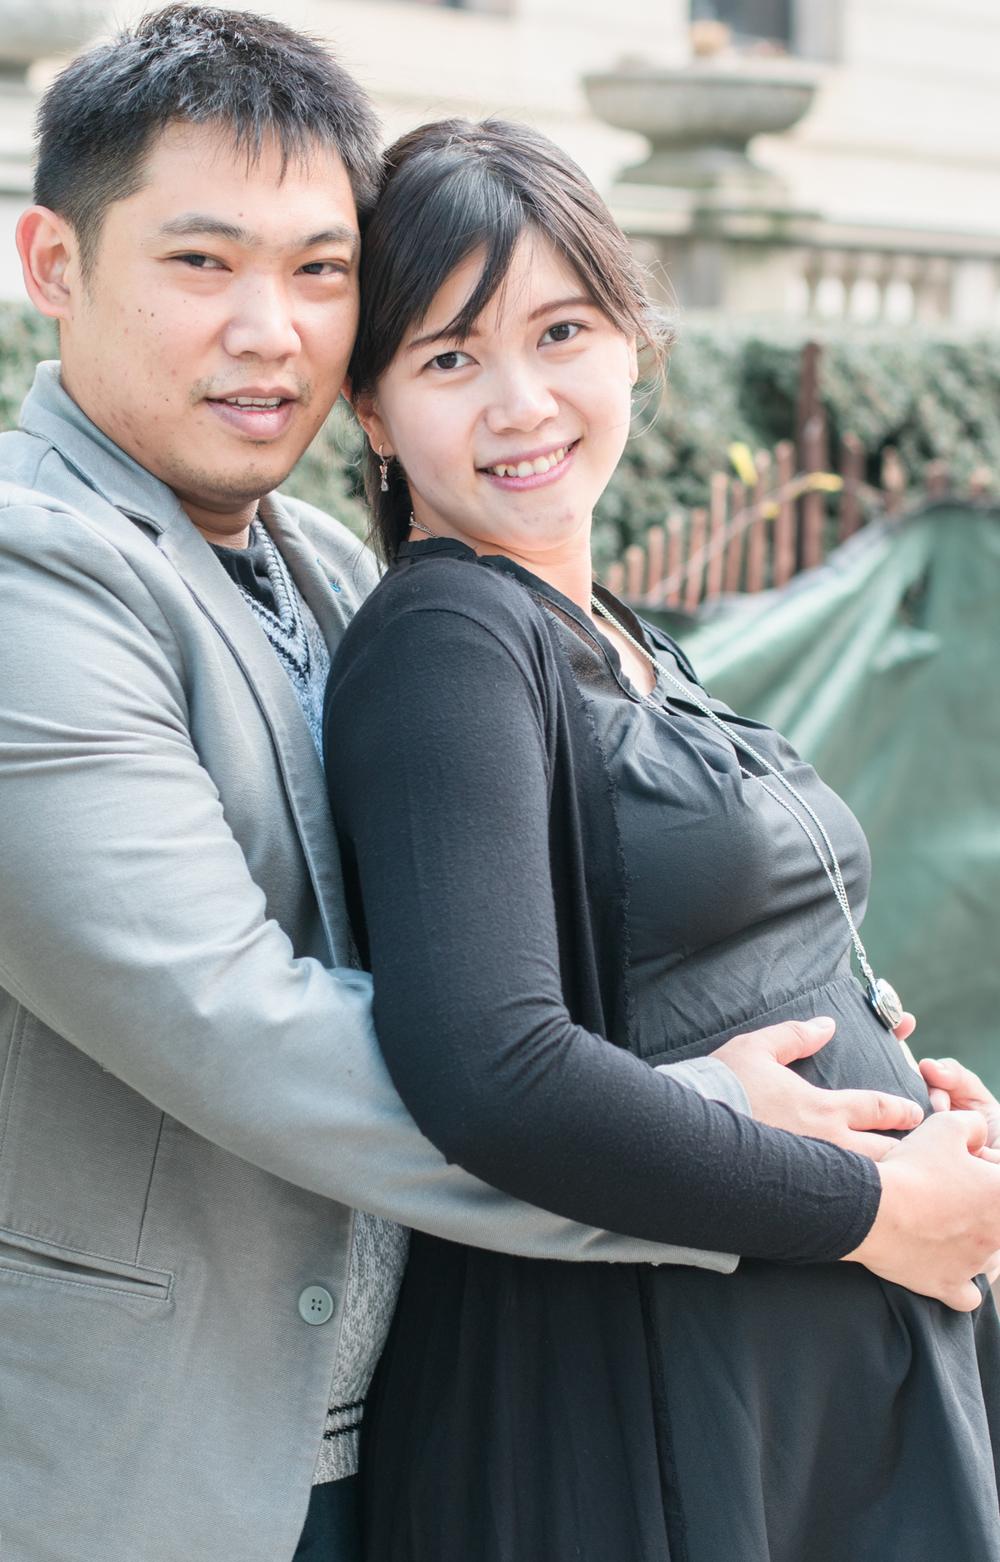 Chicago Maternity Photo